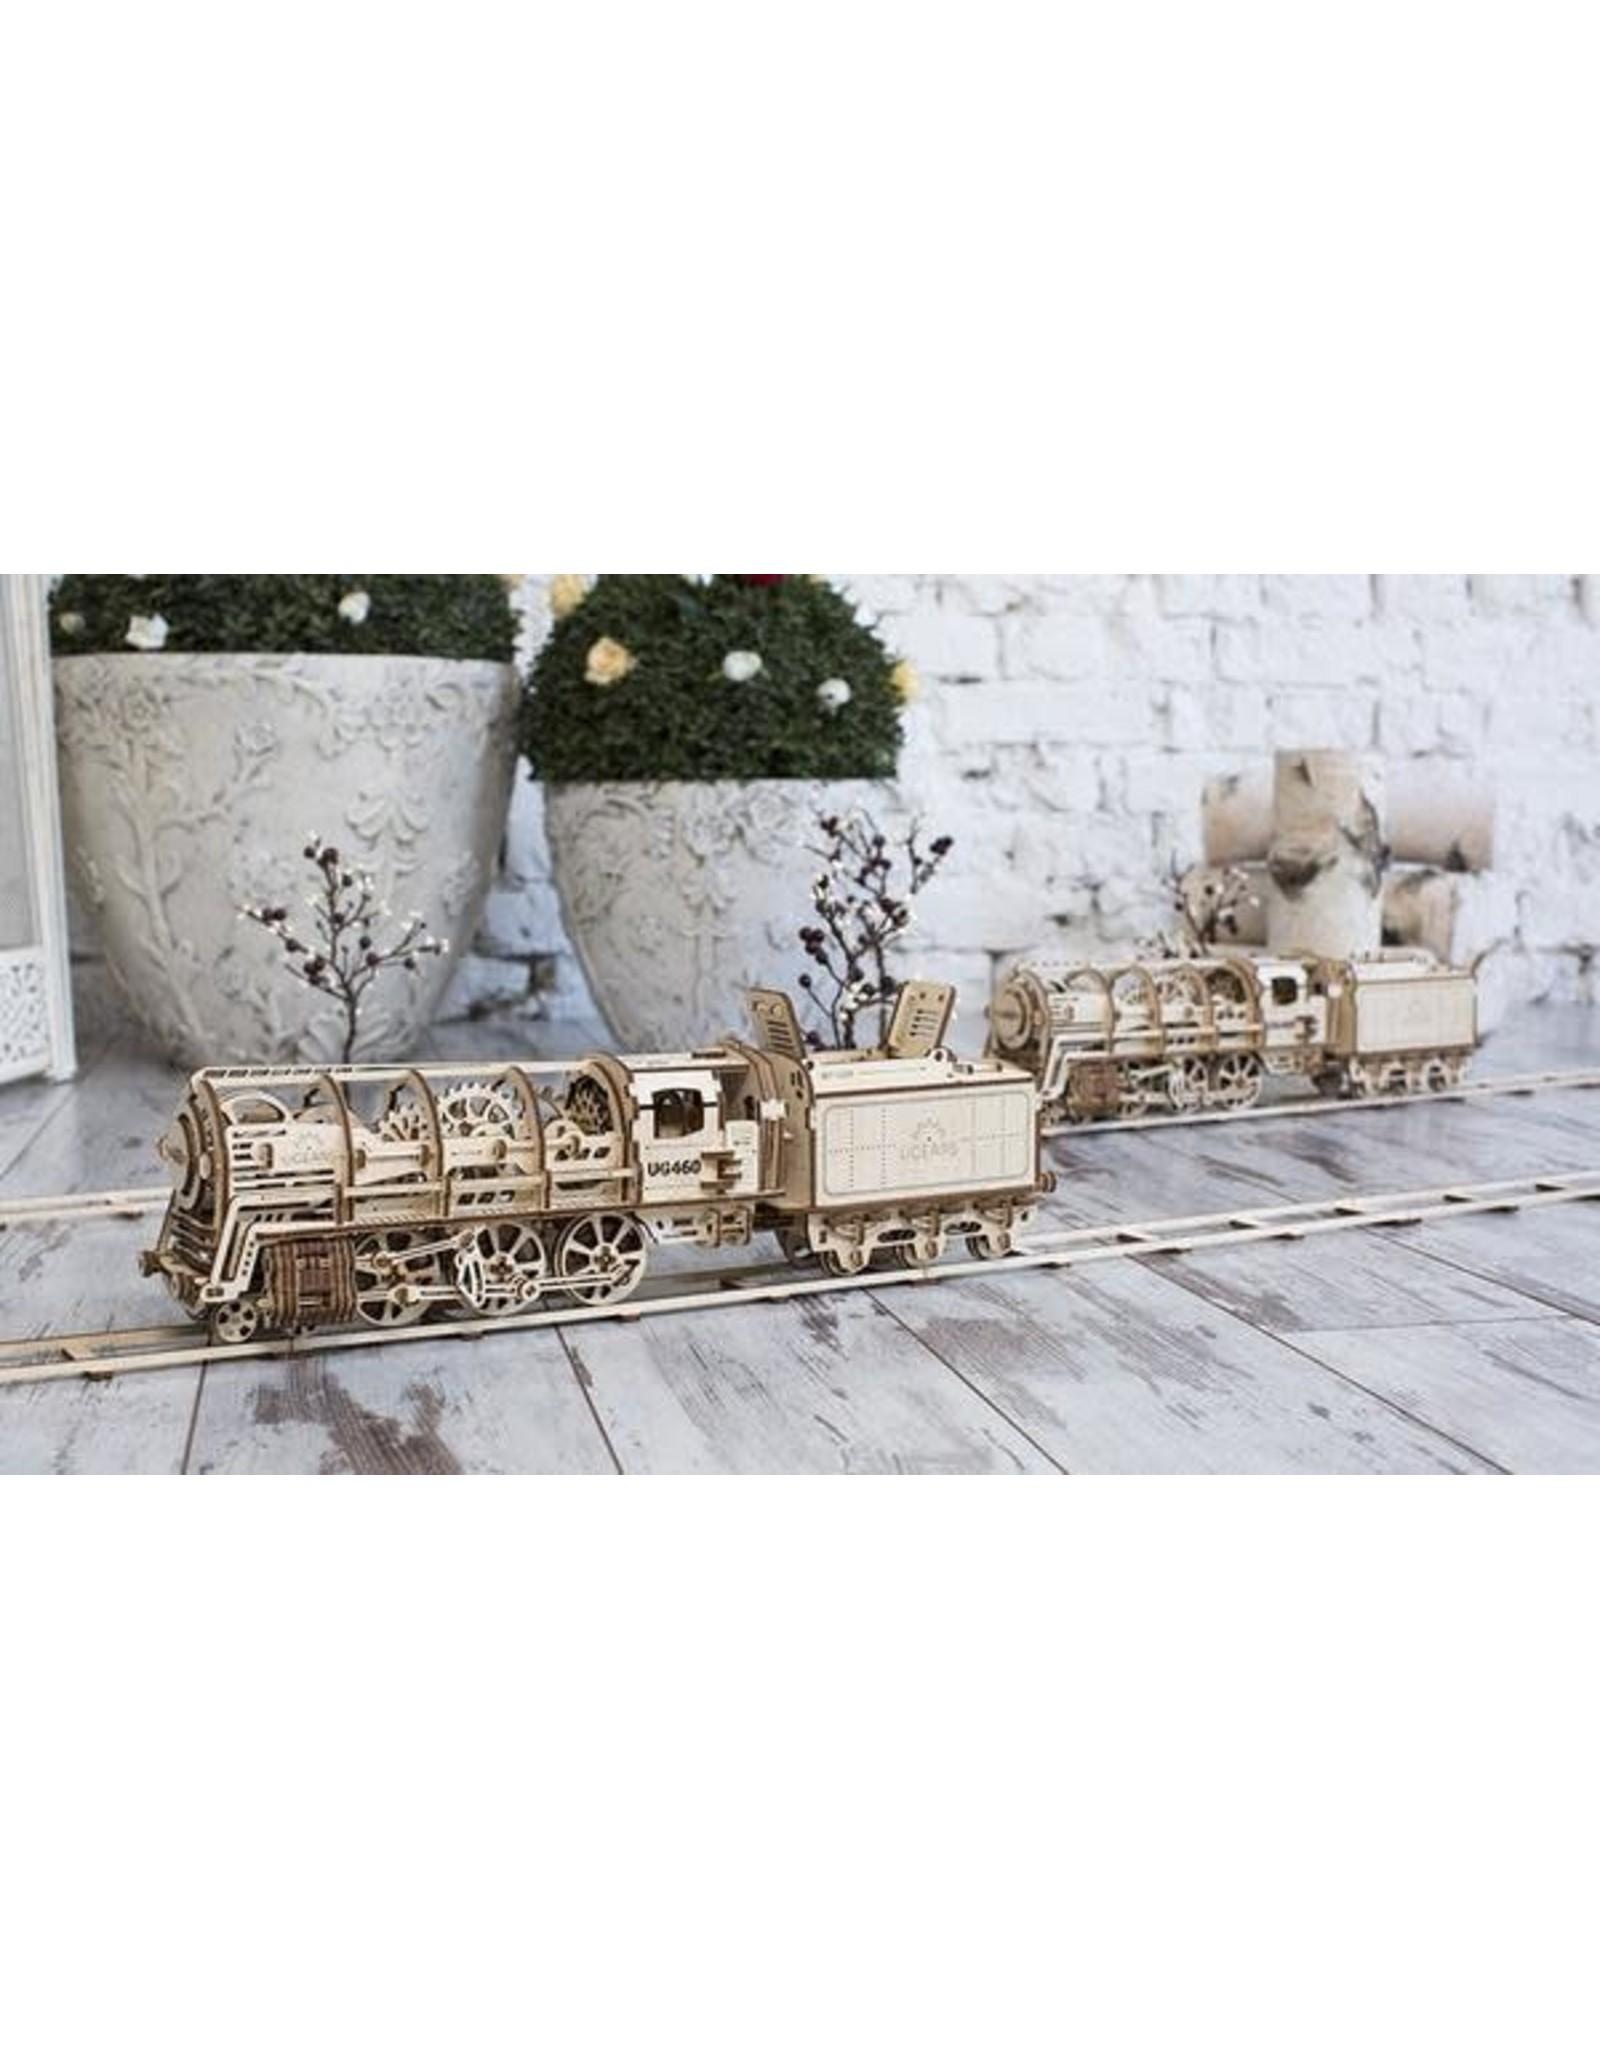 UGears Locomotive with Tender Wood Model